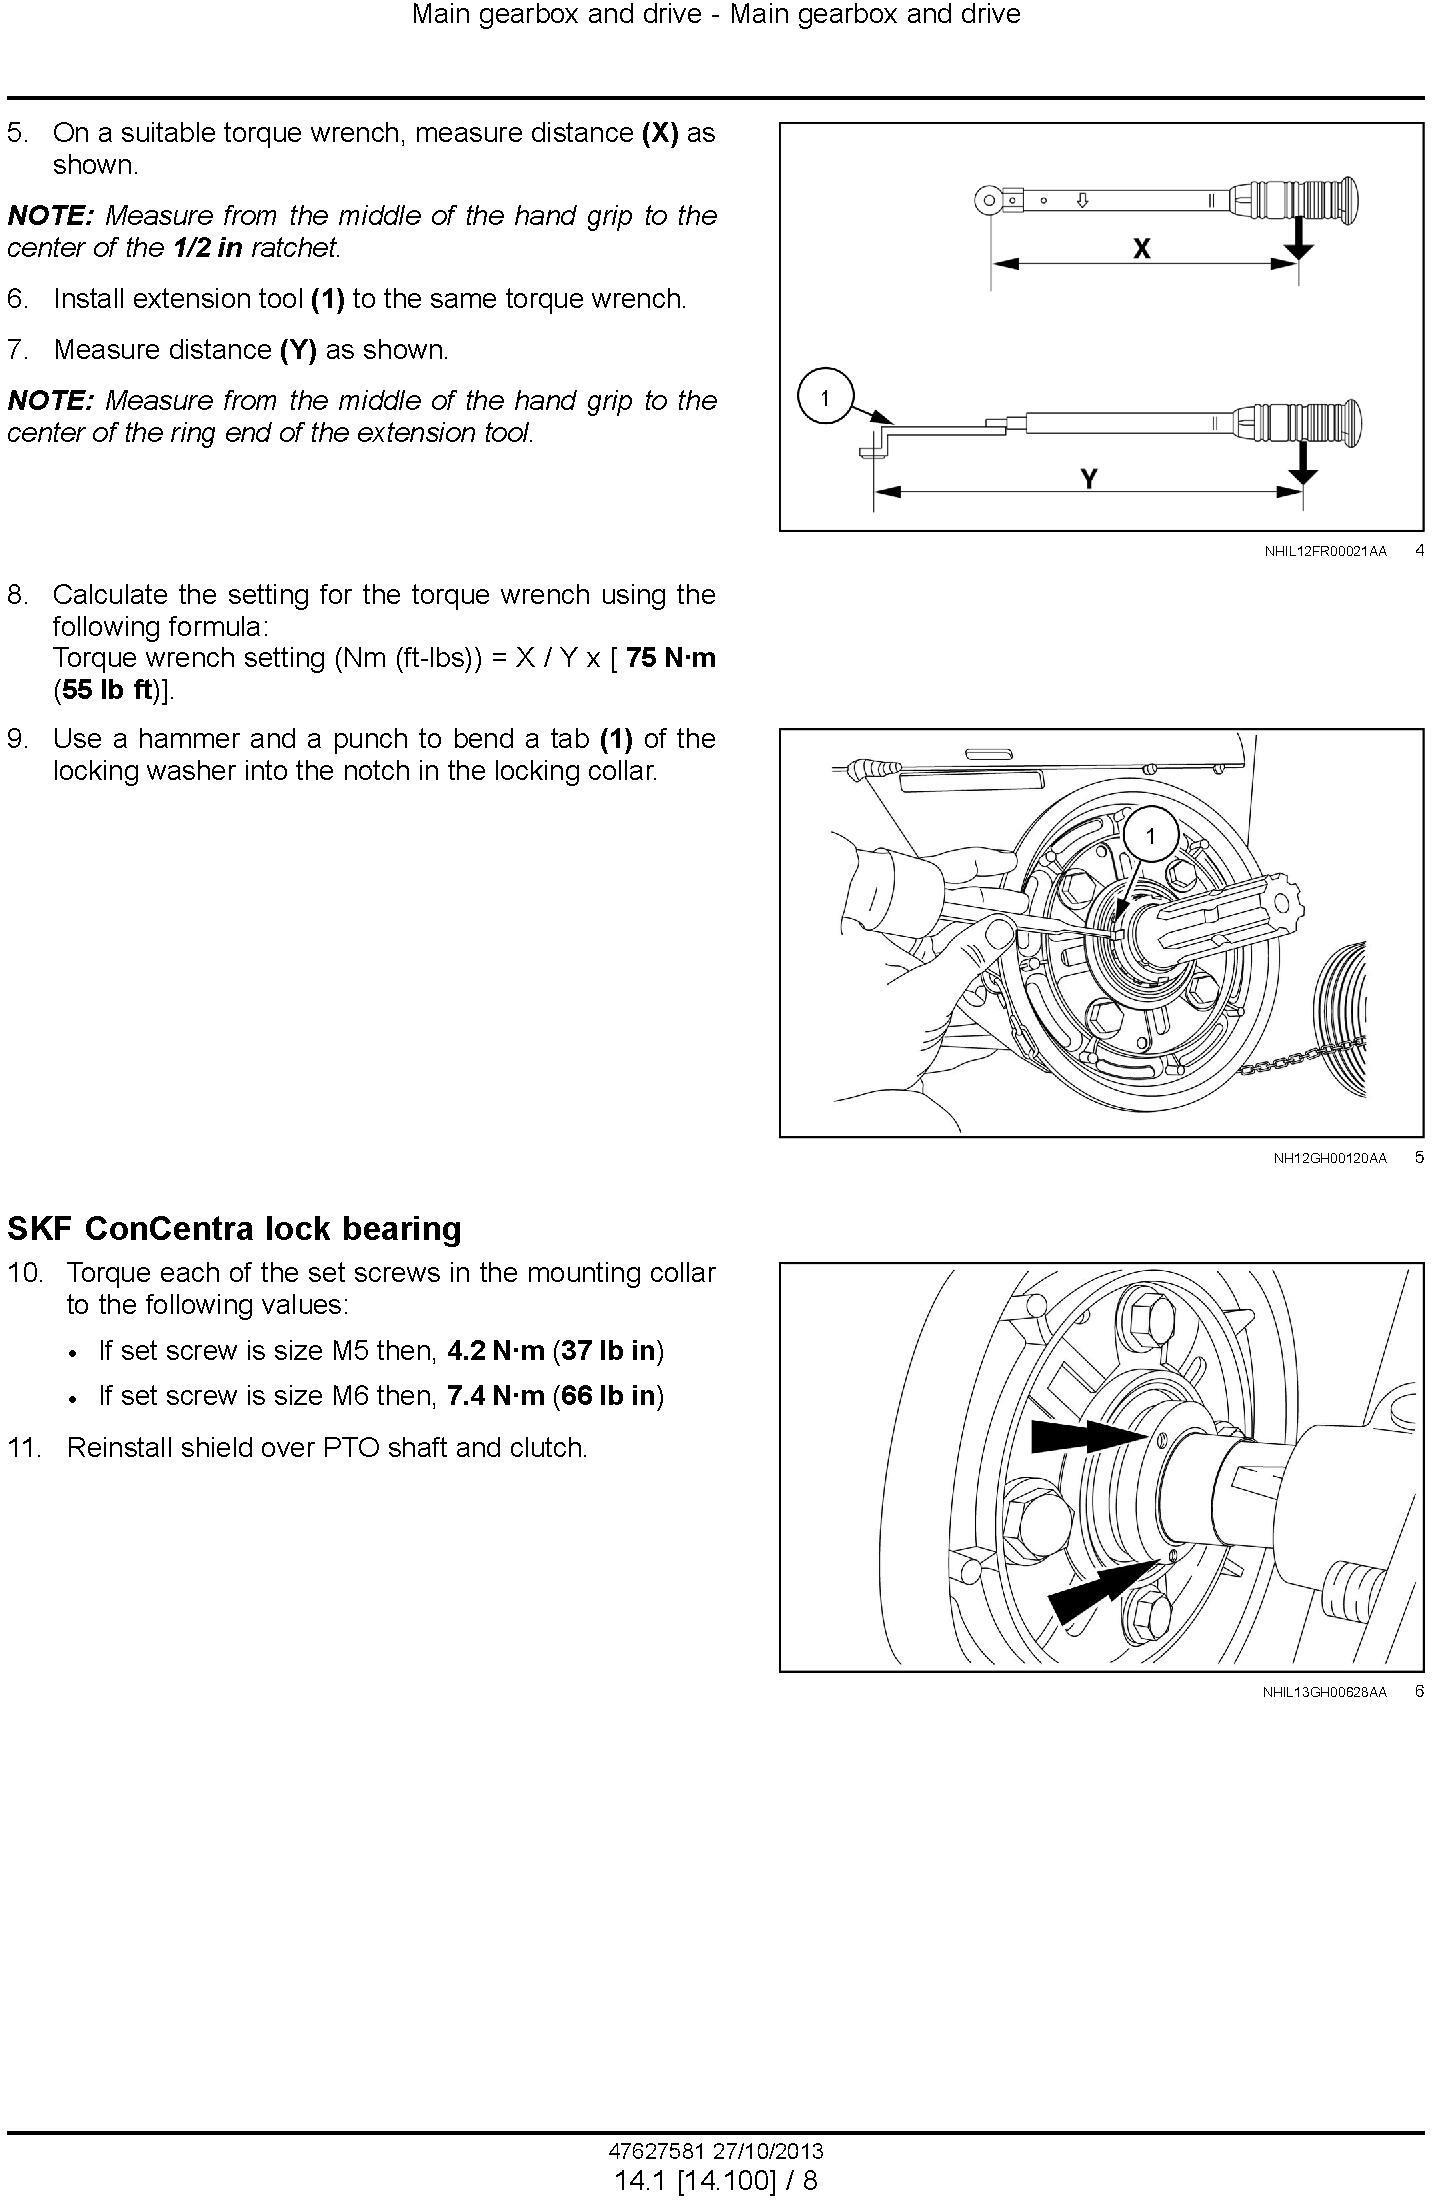 New Holland 740CF Super Flex Auger Header Service Manual - 3